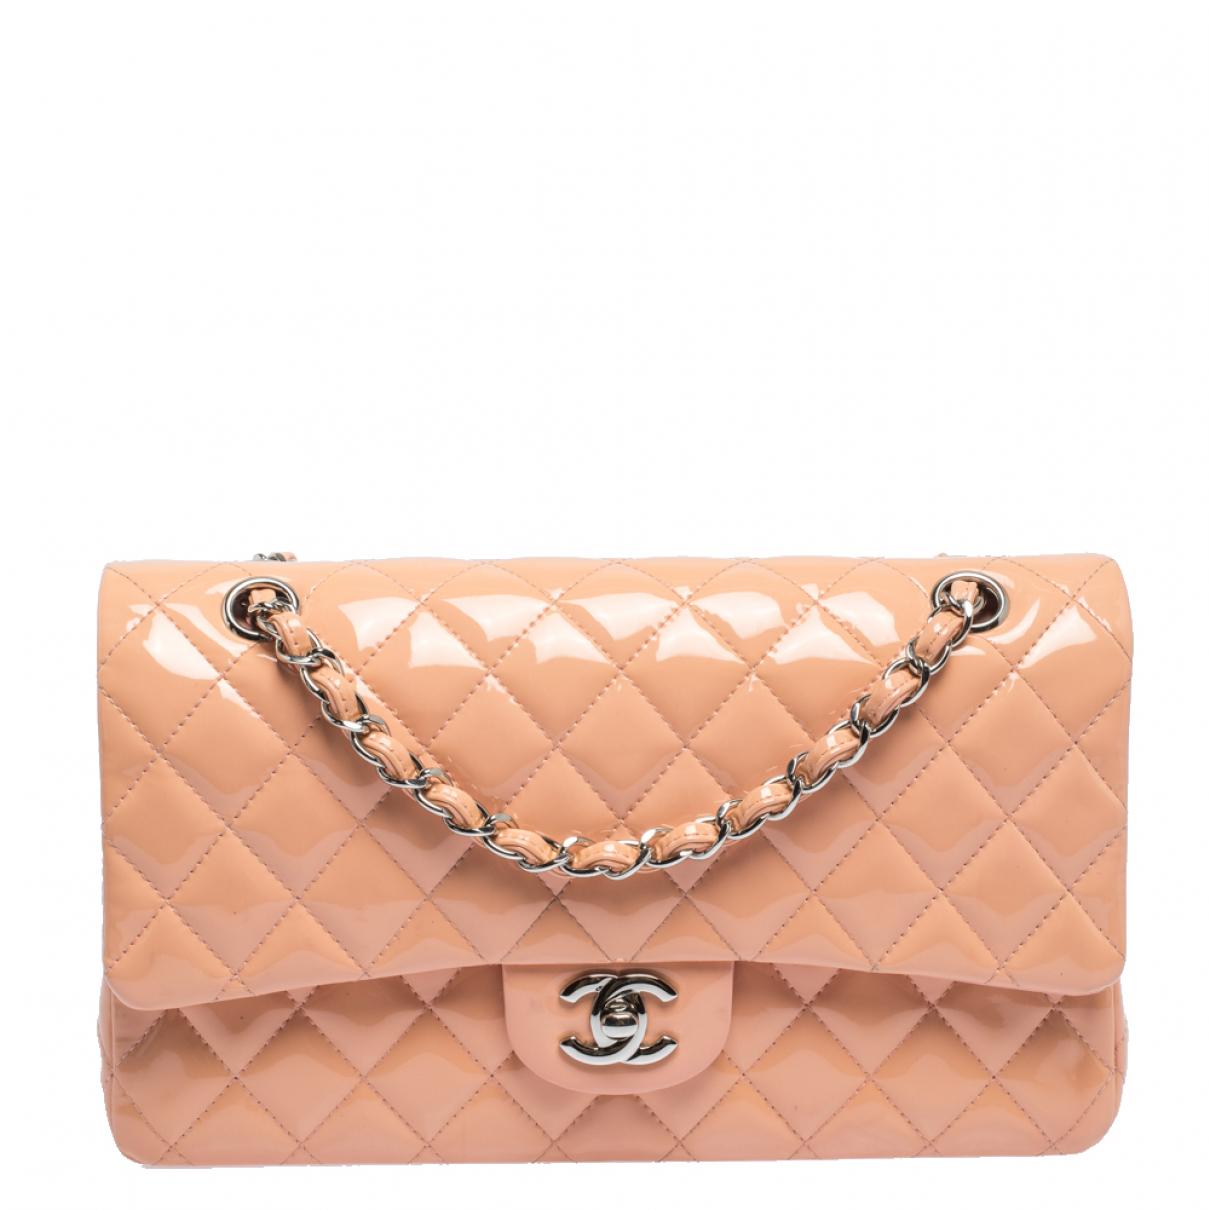 Chanel N Pink Leather handbag for Women N